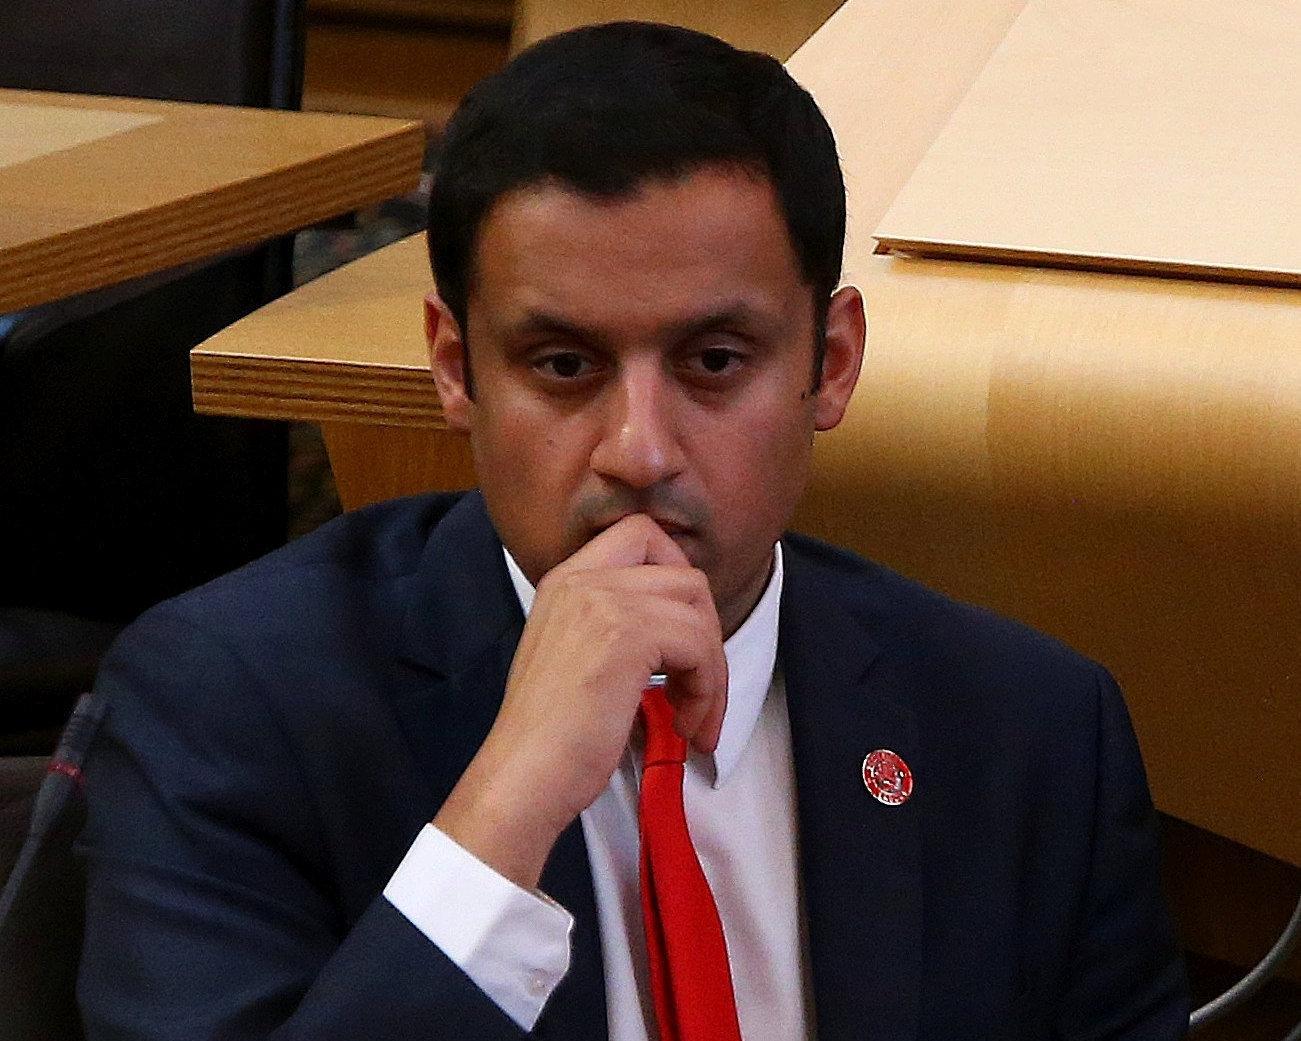 Holyrood to probe anti-Muslim hatred in Scotland